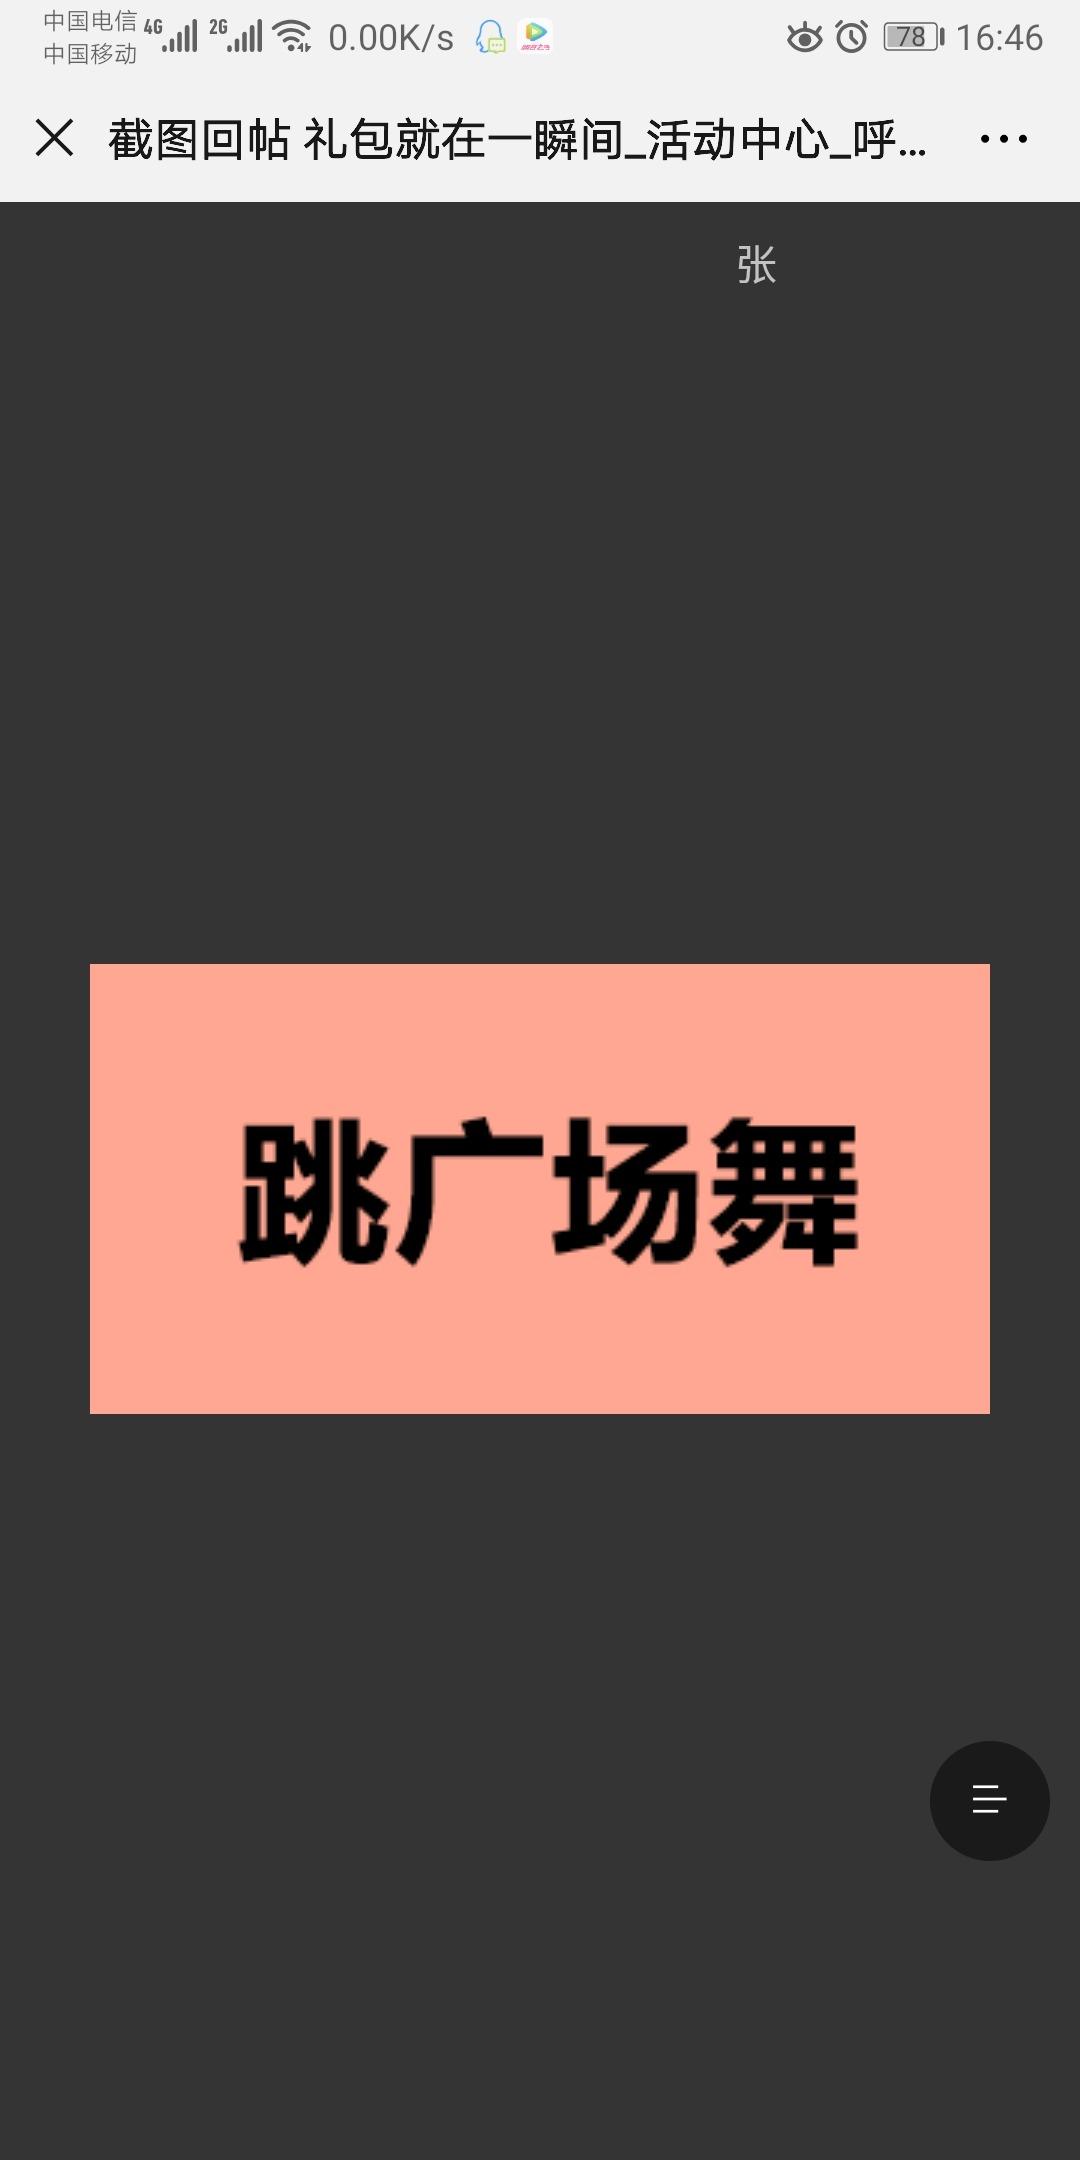 Screenshot_20190725_164628_com.tencent.mm.jpg